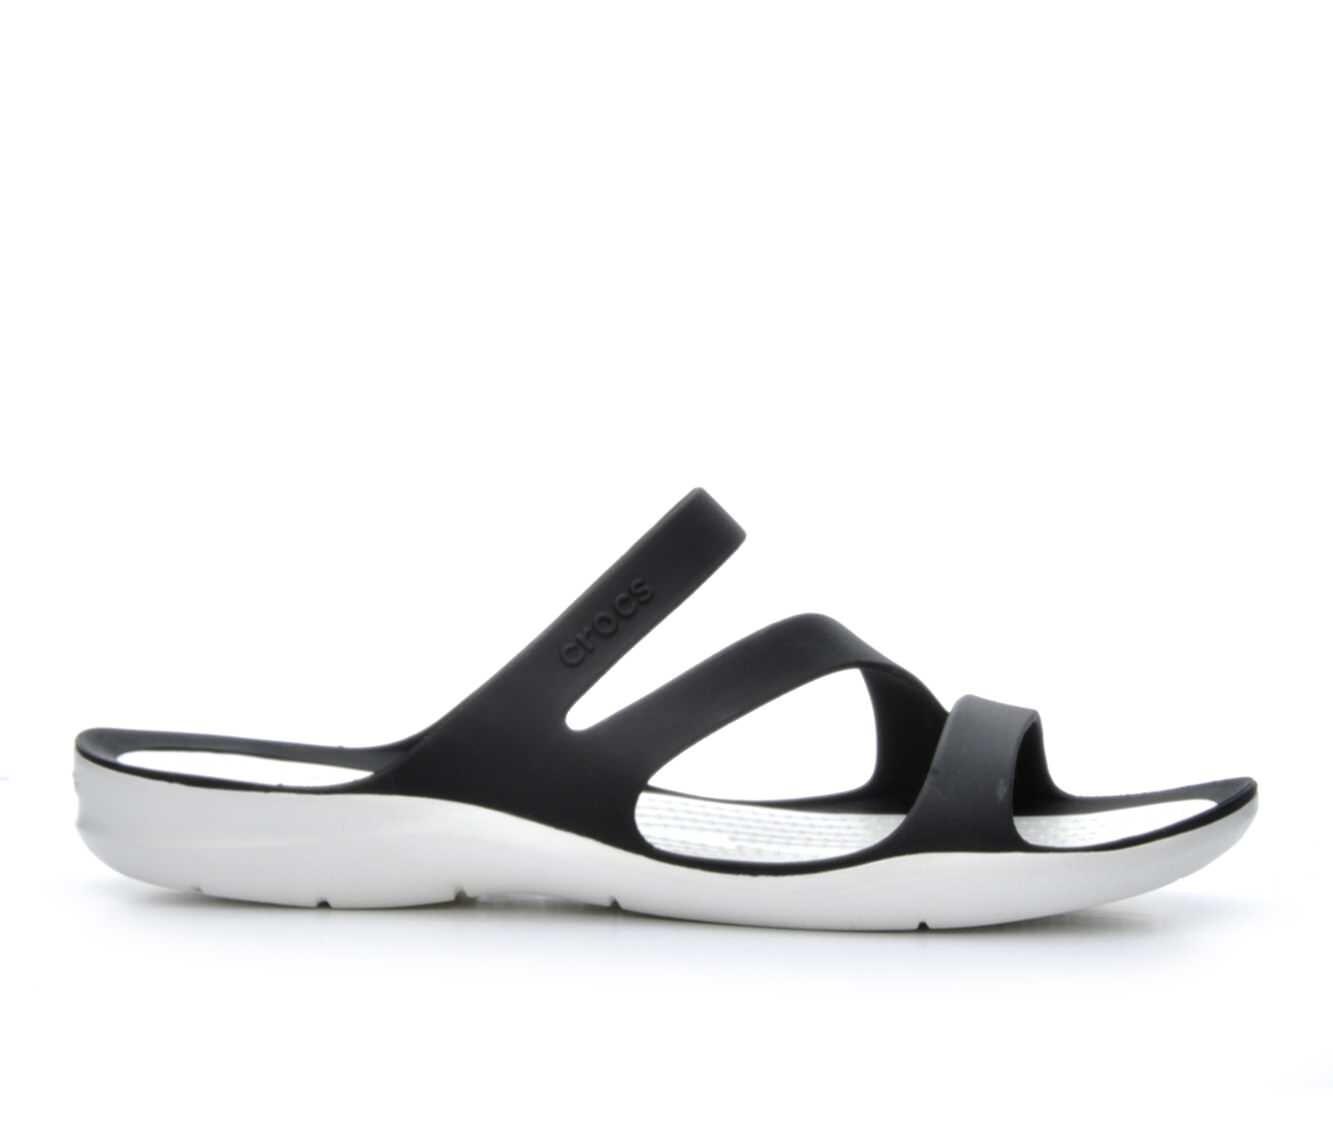 Crocs Swiftwater Sandal s5B3TAsWU